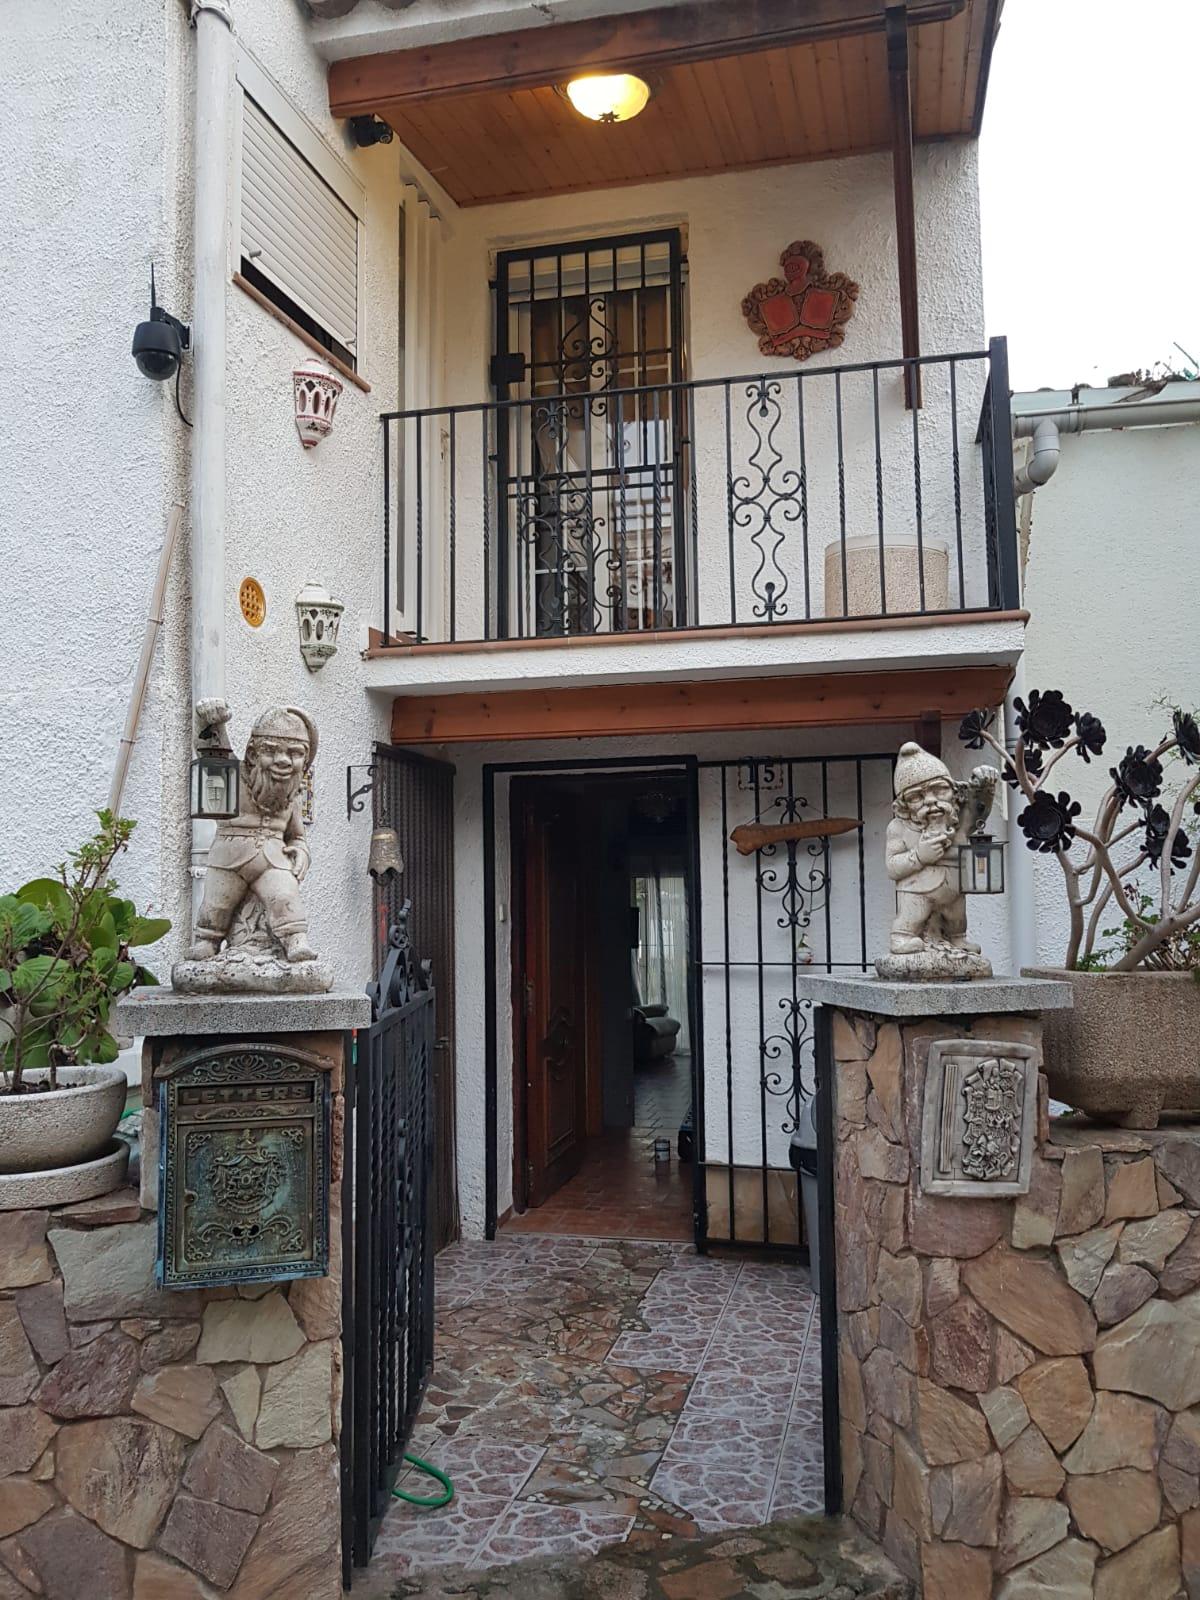 façana de la casa